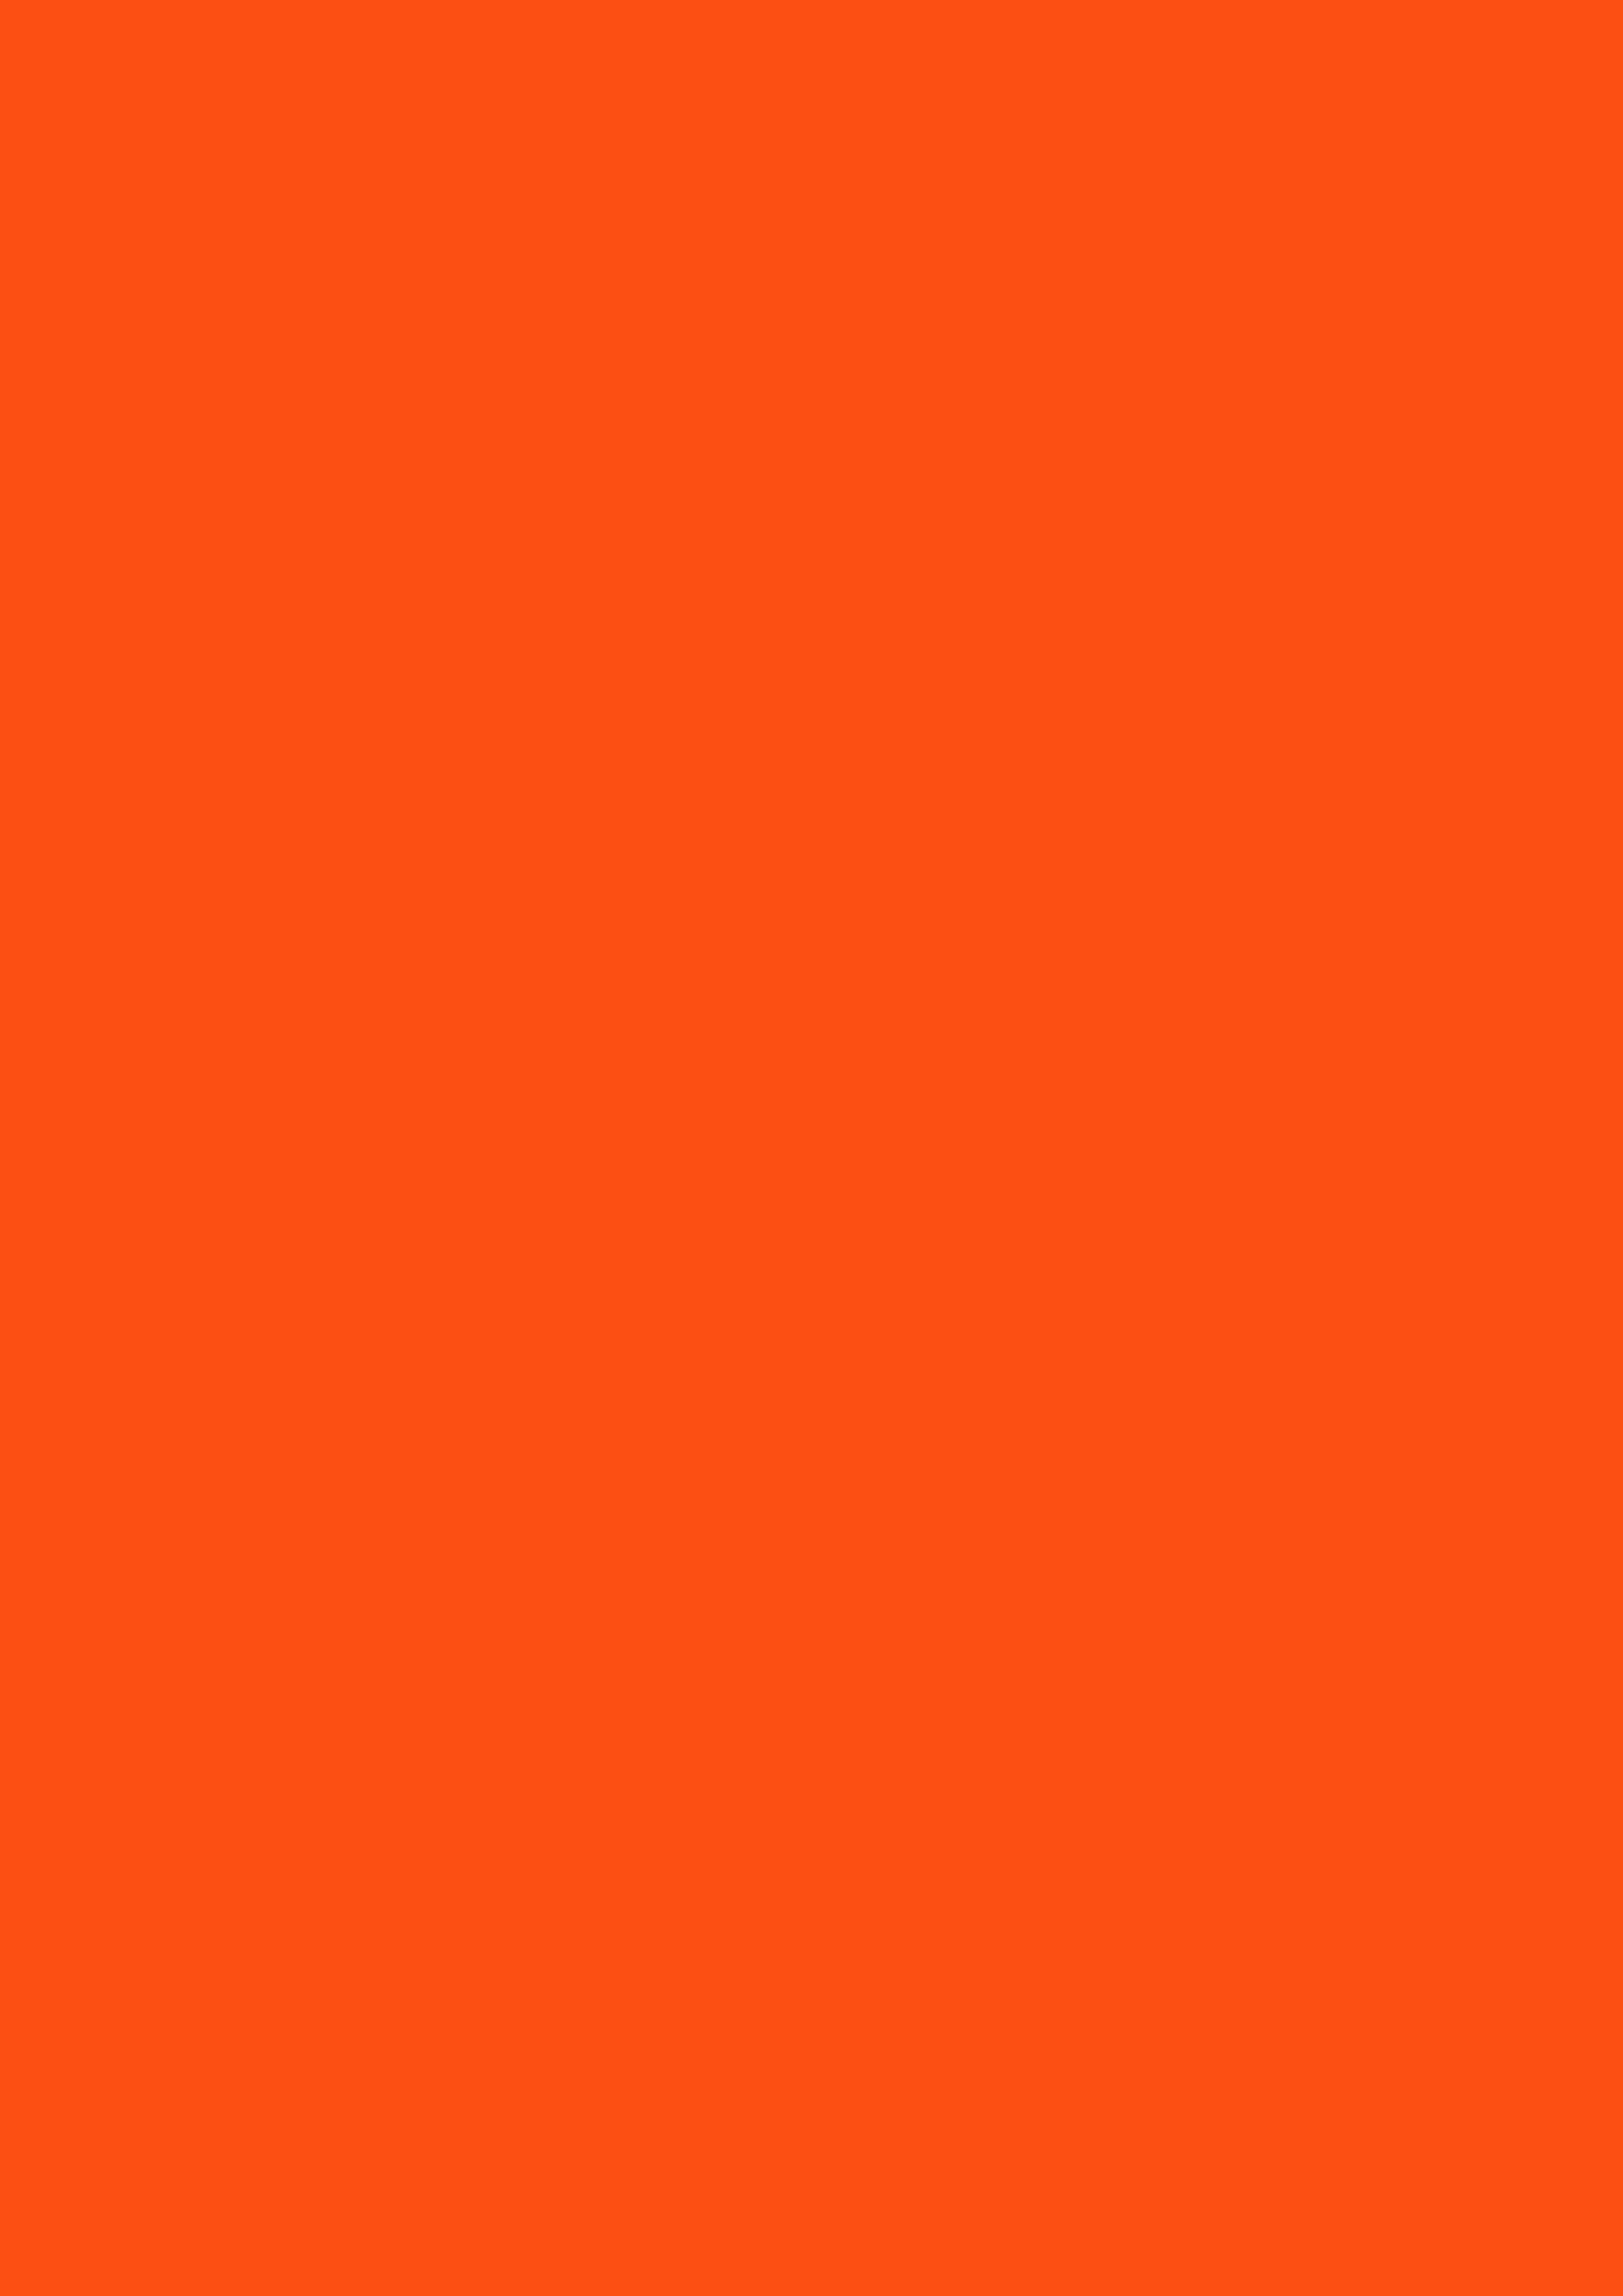 2480x3508 Orioles Orange Solid Color Background